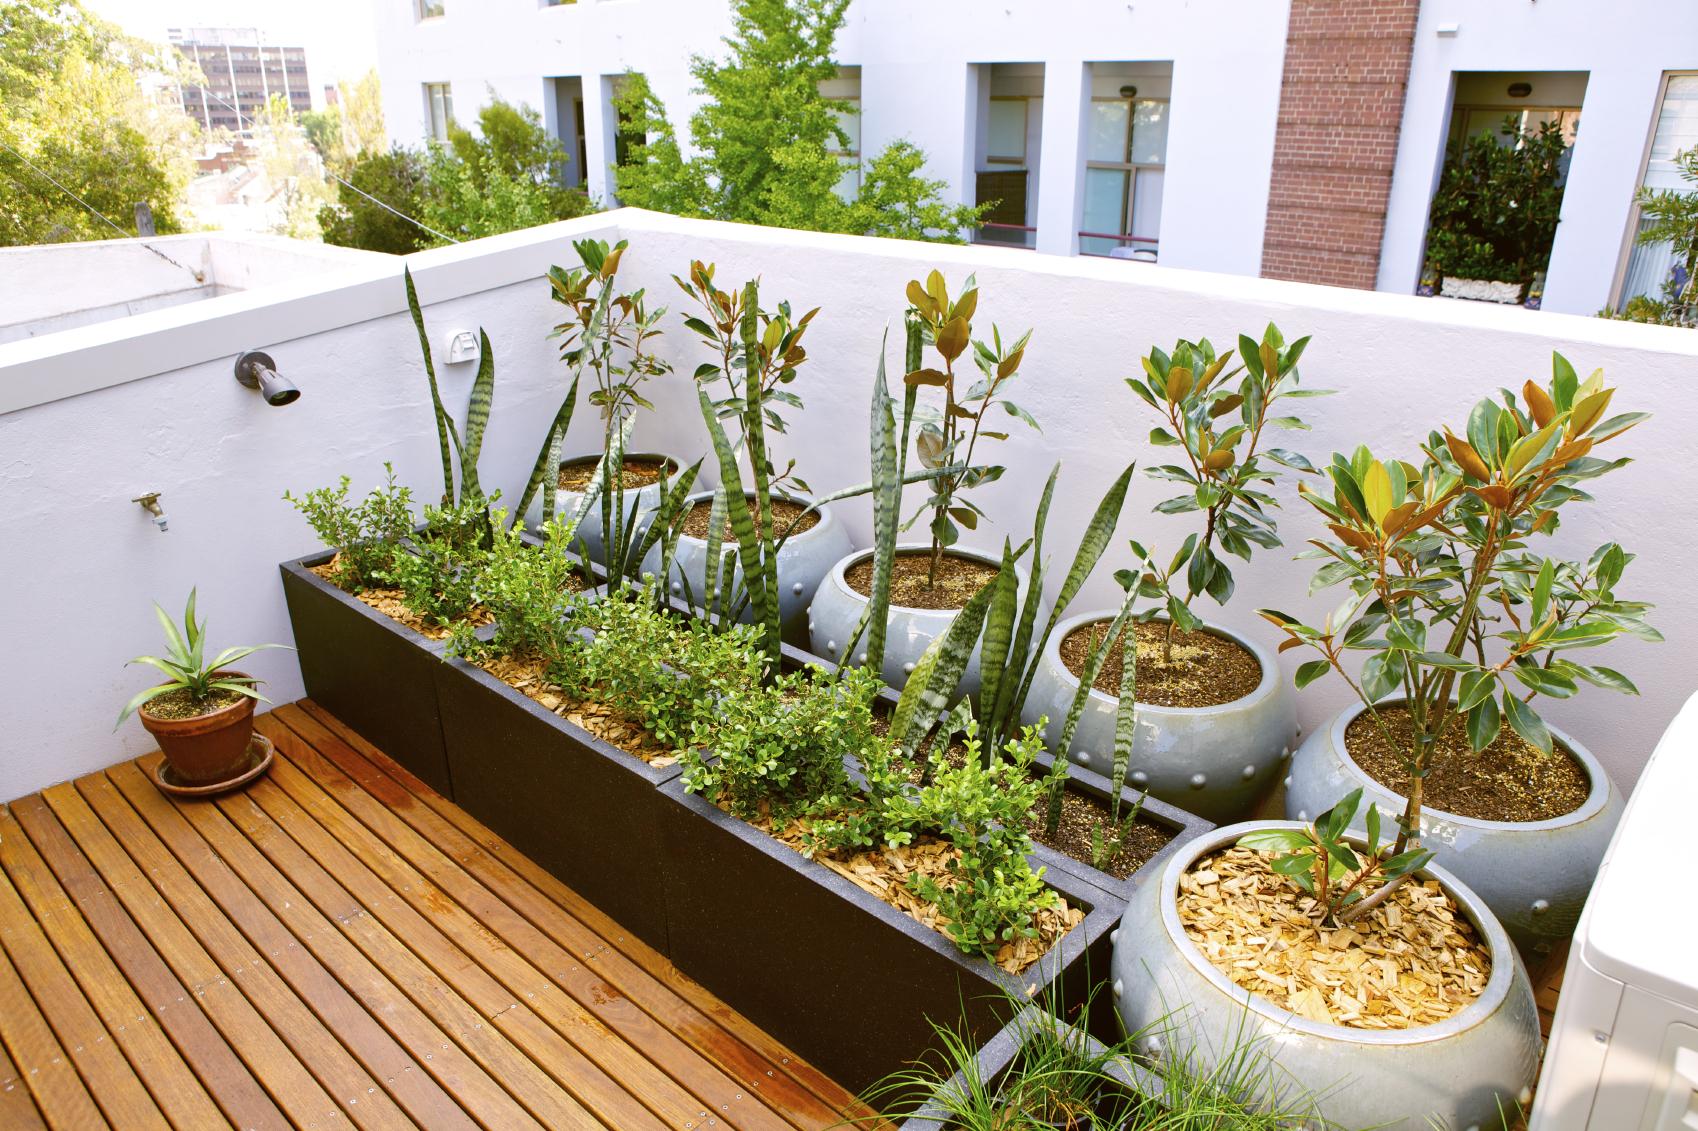 rooftop flower gardens photo - 8